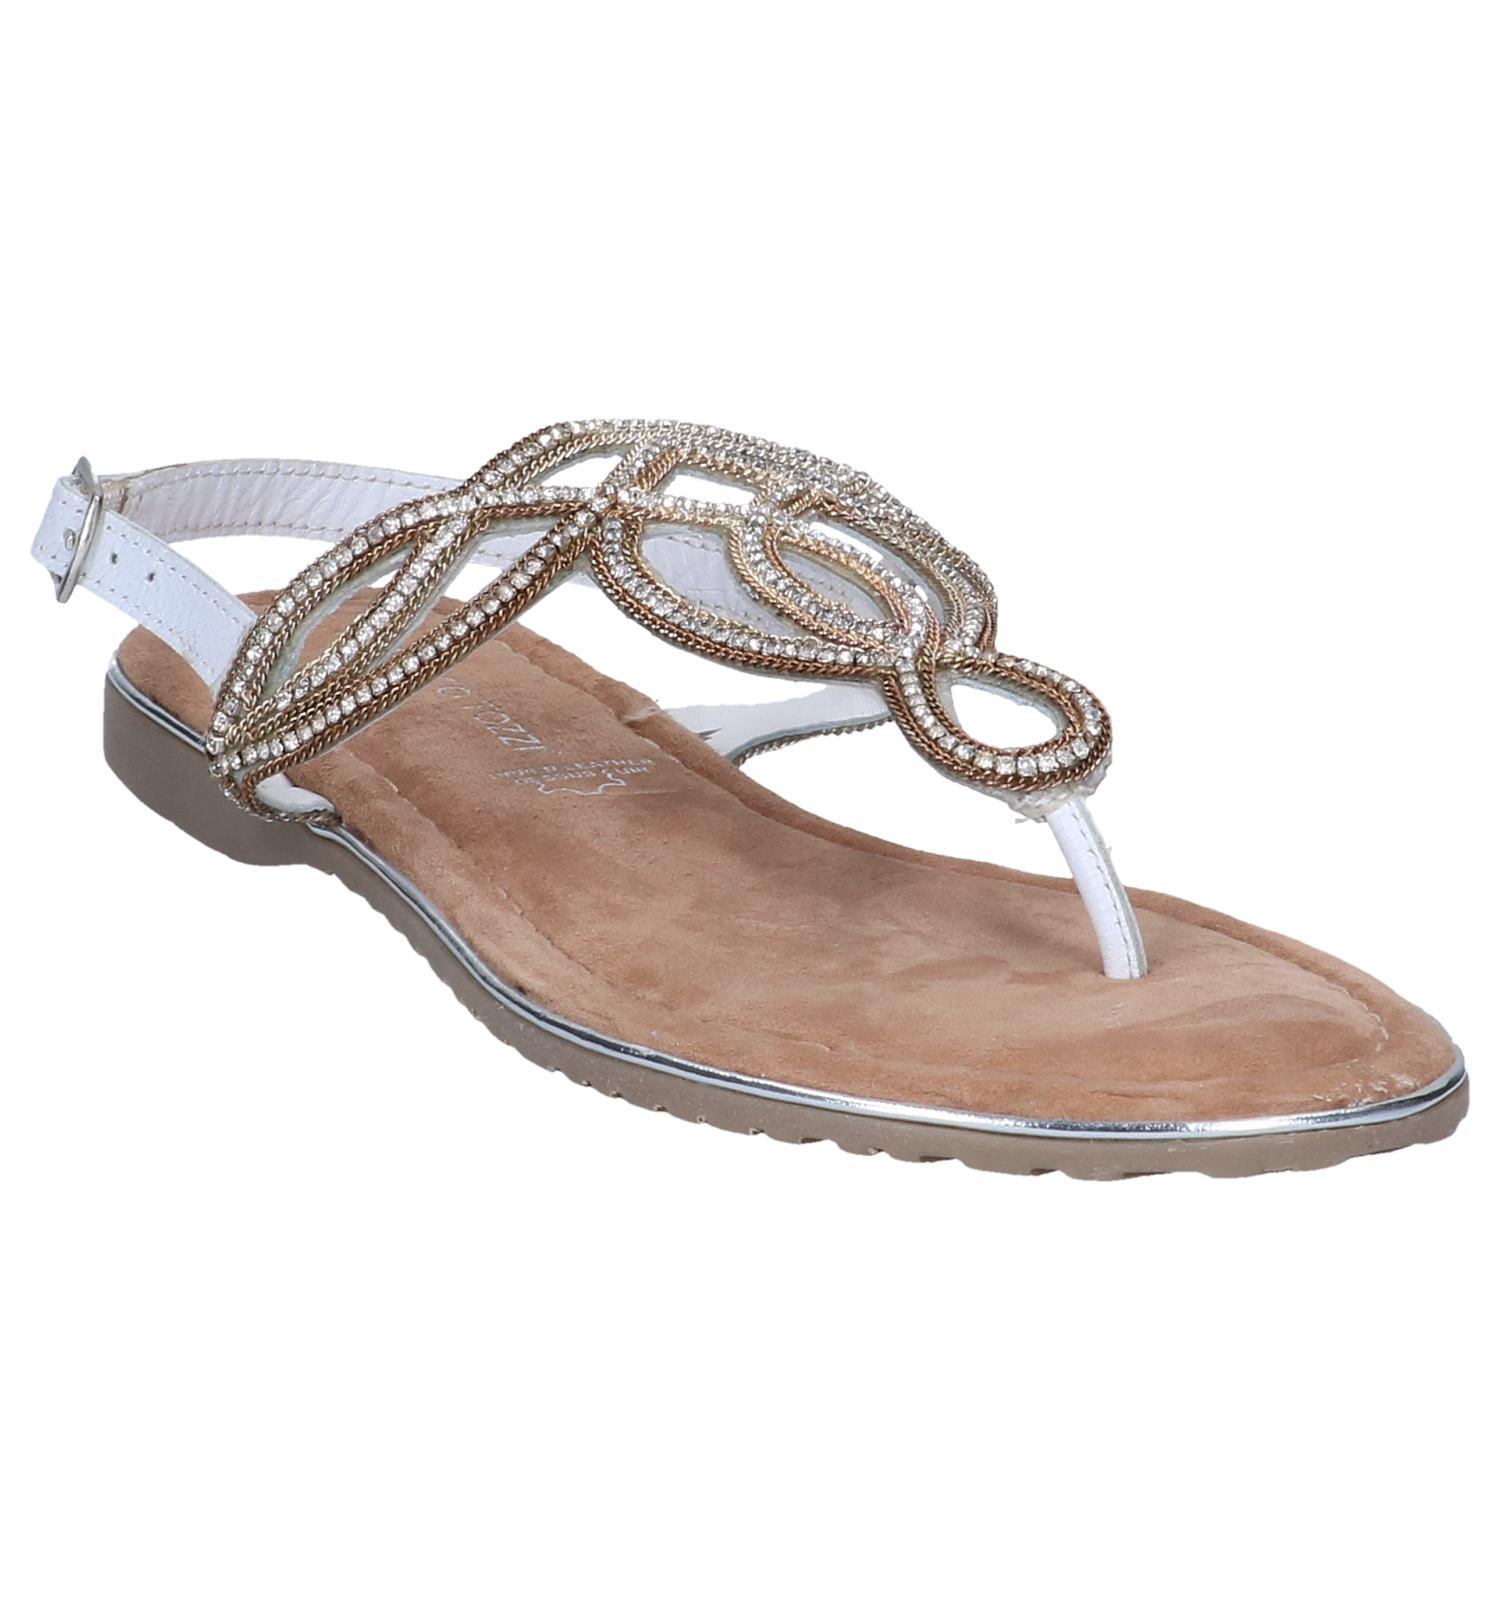 Sandalen Wit Wit Sandalen Tozzi gouden Marco Tozzi gouden Wit Sandalen gouden Marco Marco SMjLqVpGUz